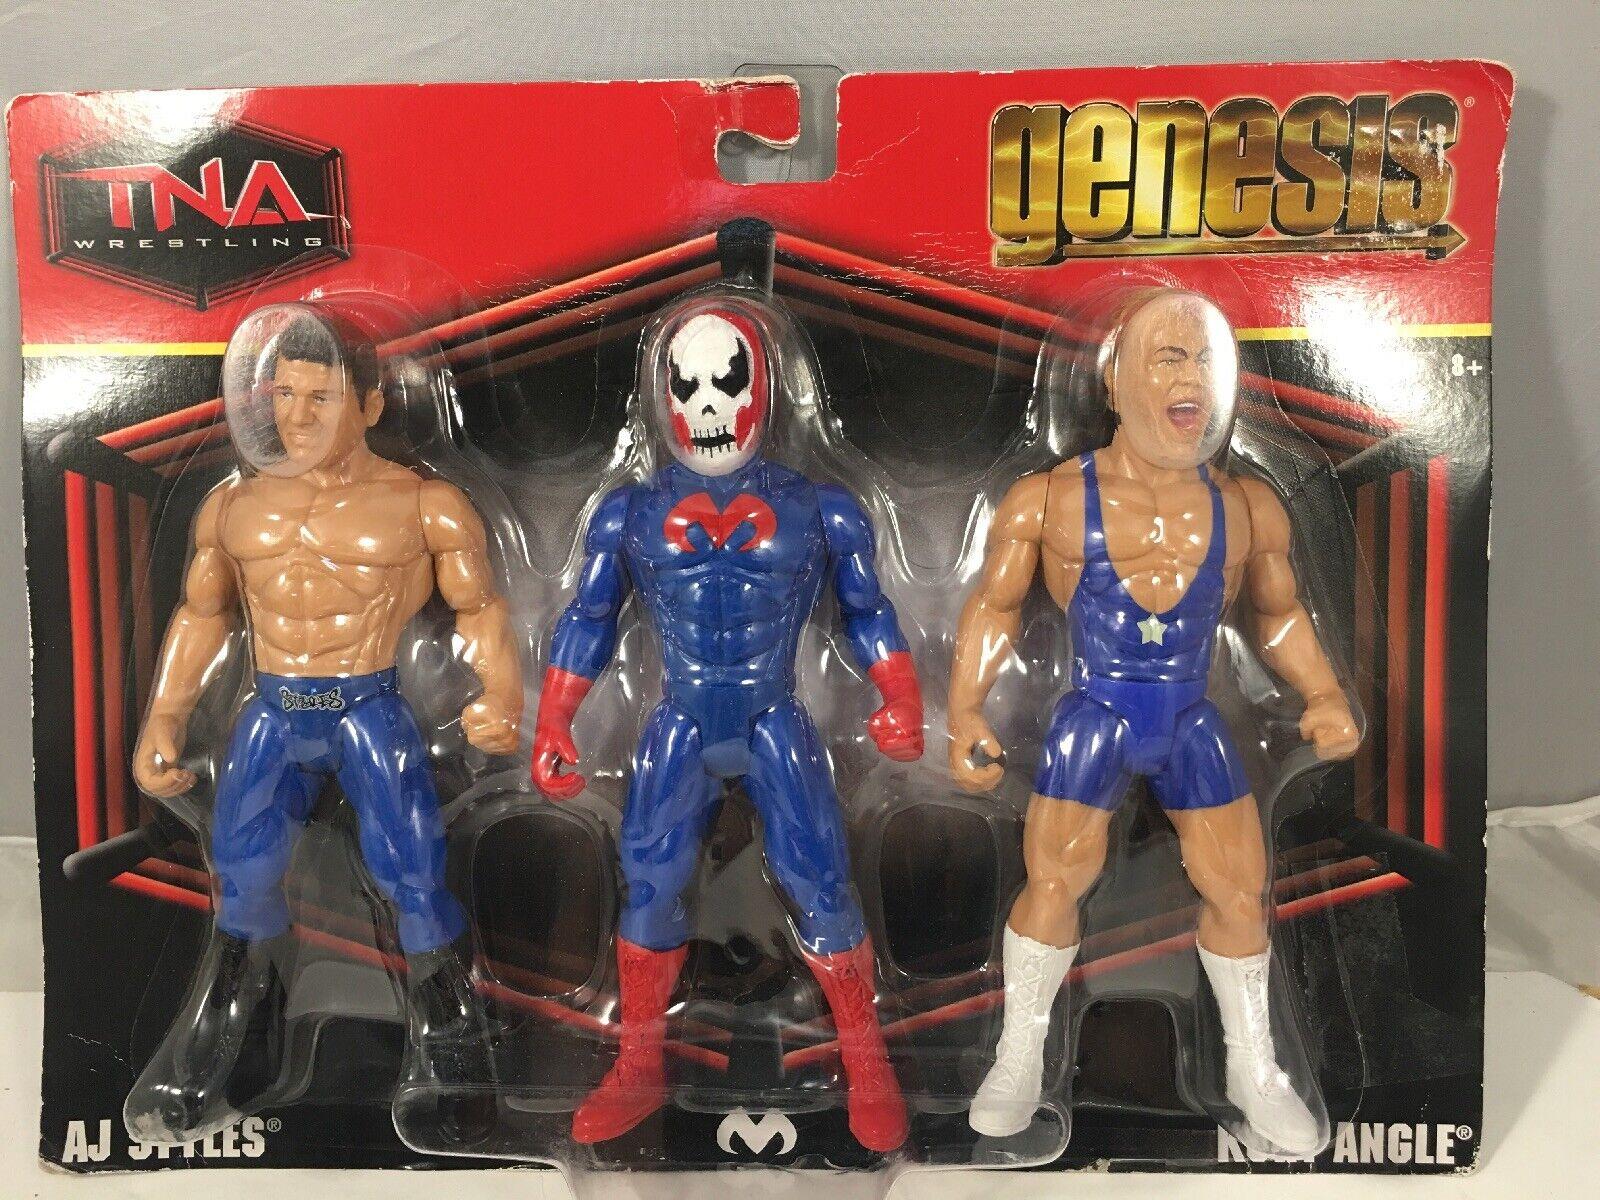 TNA WWE Wrestling Genesis Figur Trippel packa AJ Styles, Suicide Kurt Angle